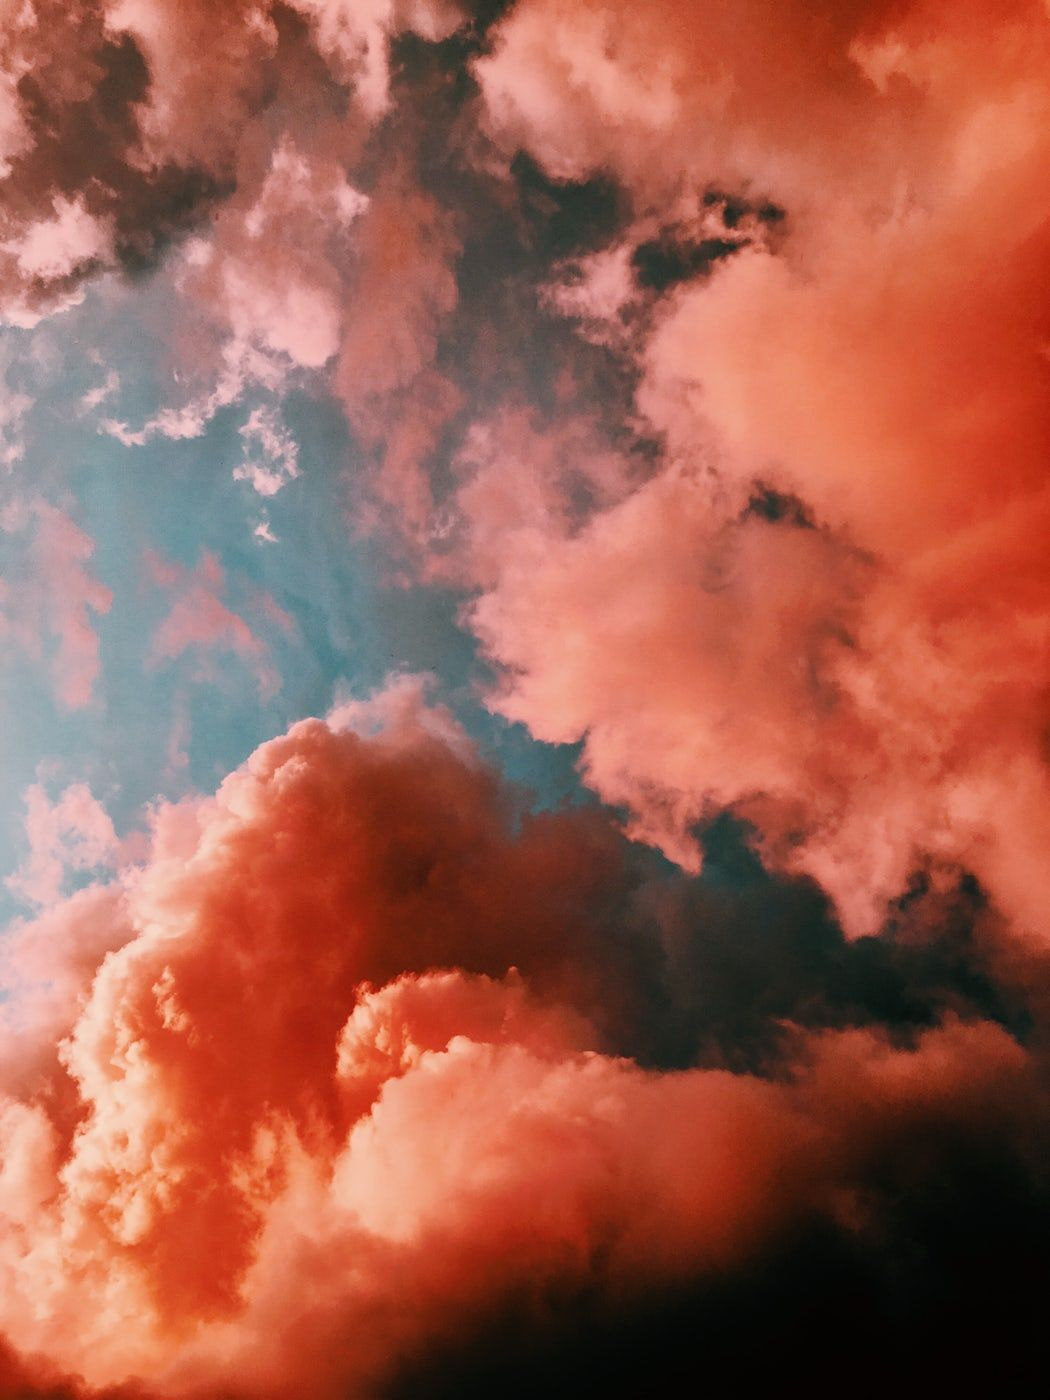 Sunset Clouds Photo By Yannis Papanastasopoulos Yannispap On Unsplash Clouds Wallpaper Iphone Cloud Wallpaper Sky Aesthetic Sunset clouds iphone full hd wallpaper